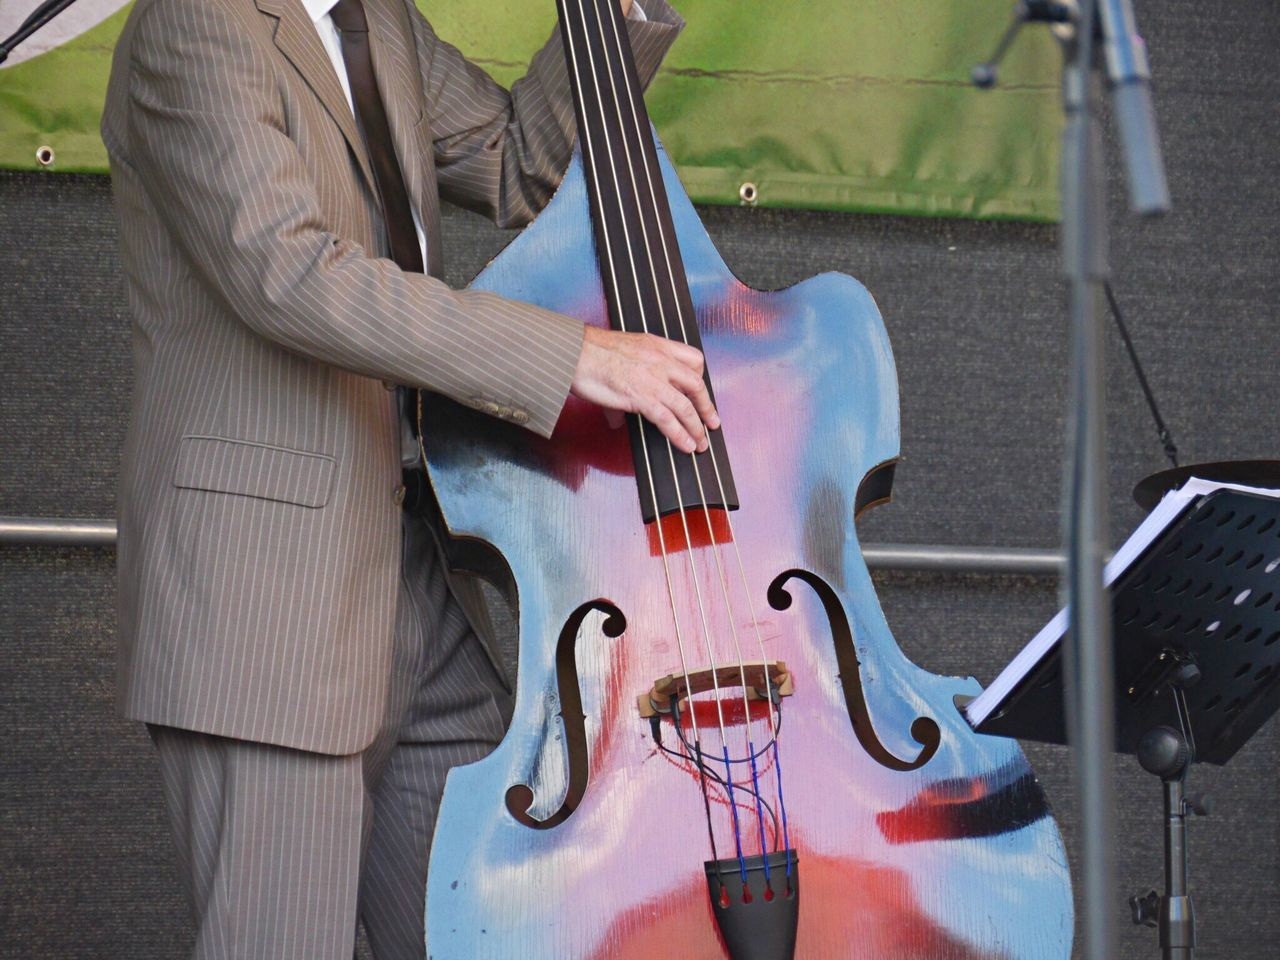 Rock'n'Roll Weekend the bass player Music Dance Fifties & Sixties Fun Eye4photography  Tadaa Community